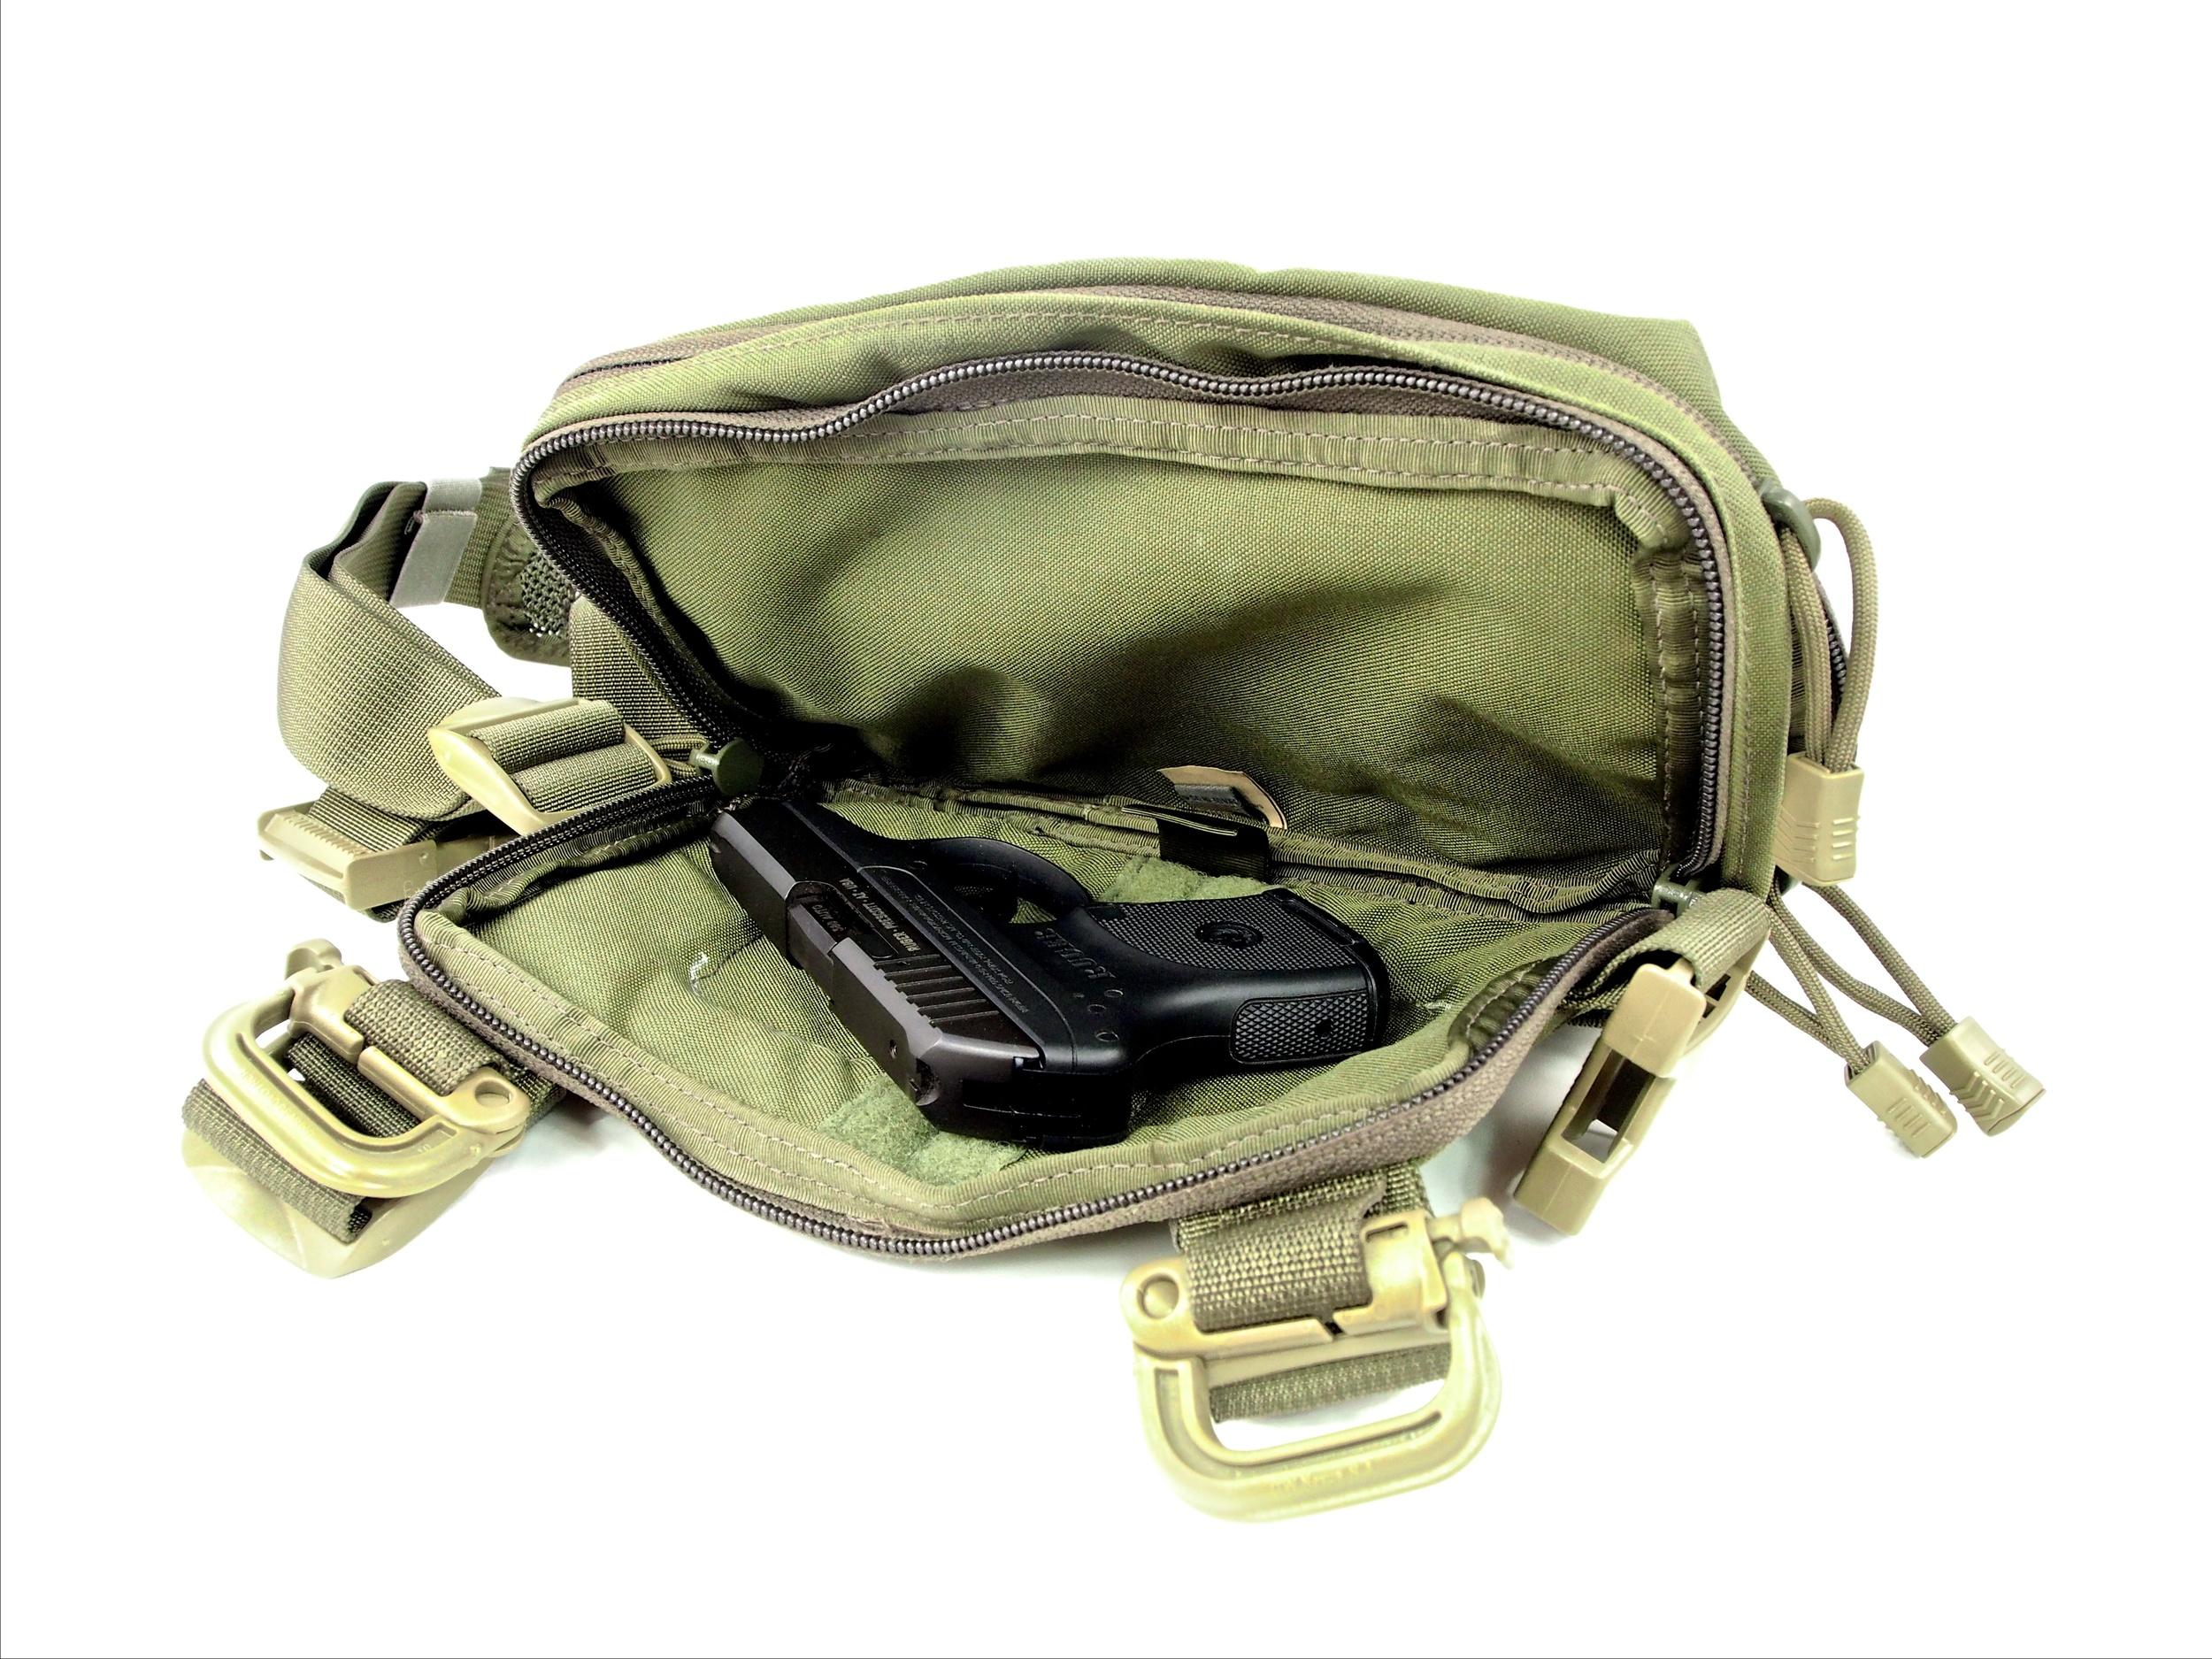 Hill People Gear Kit Bag